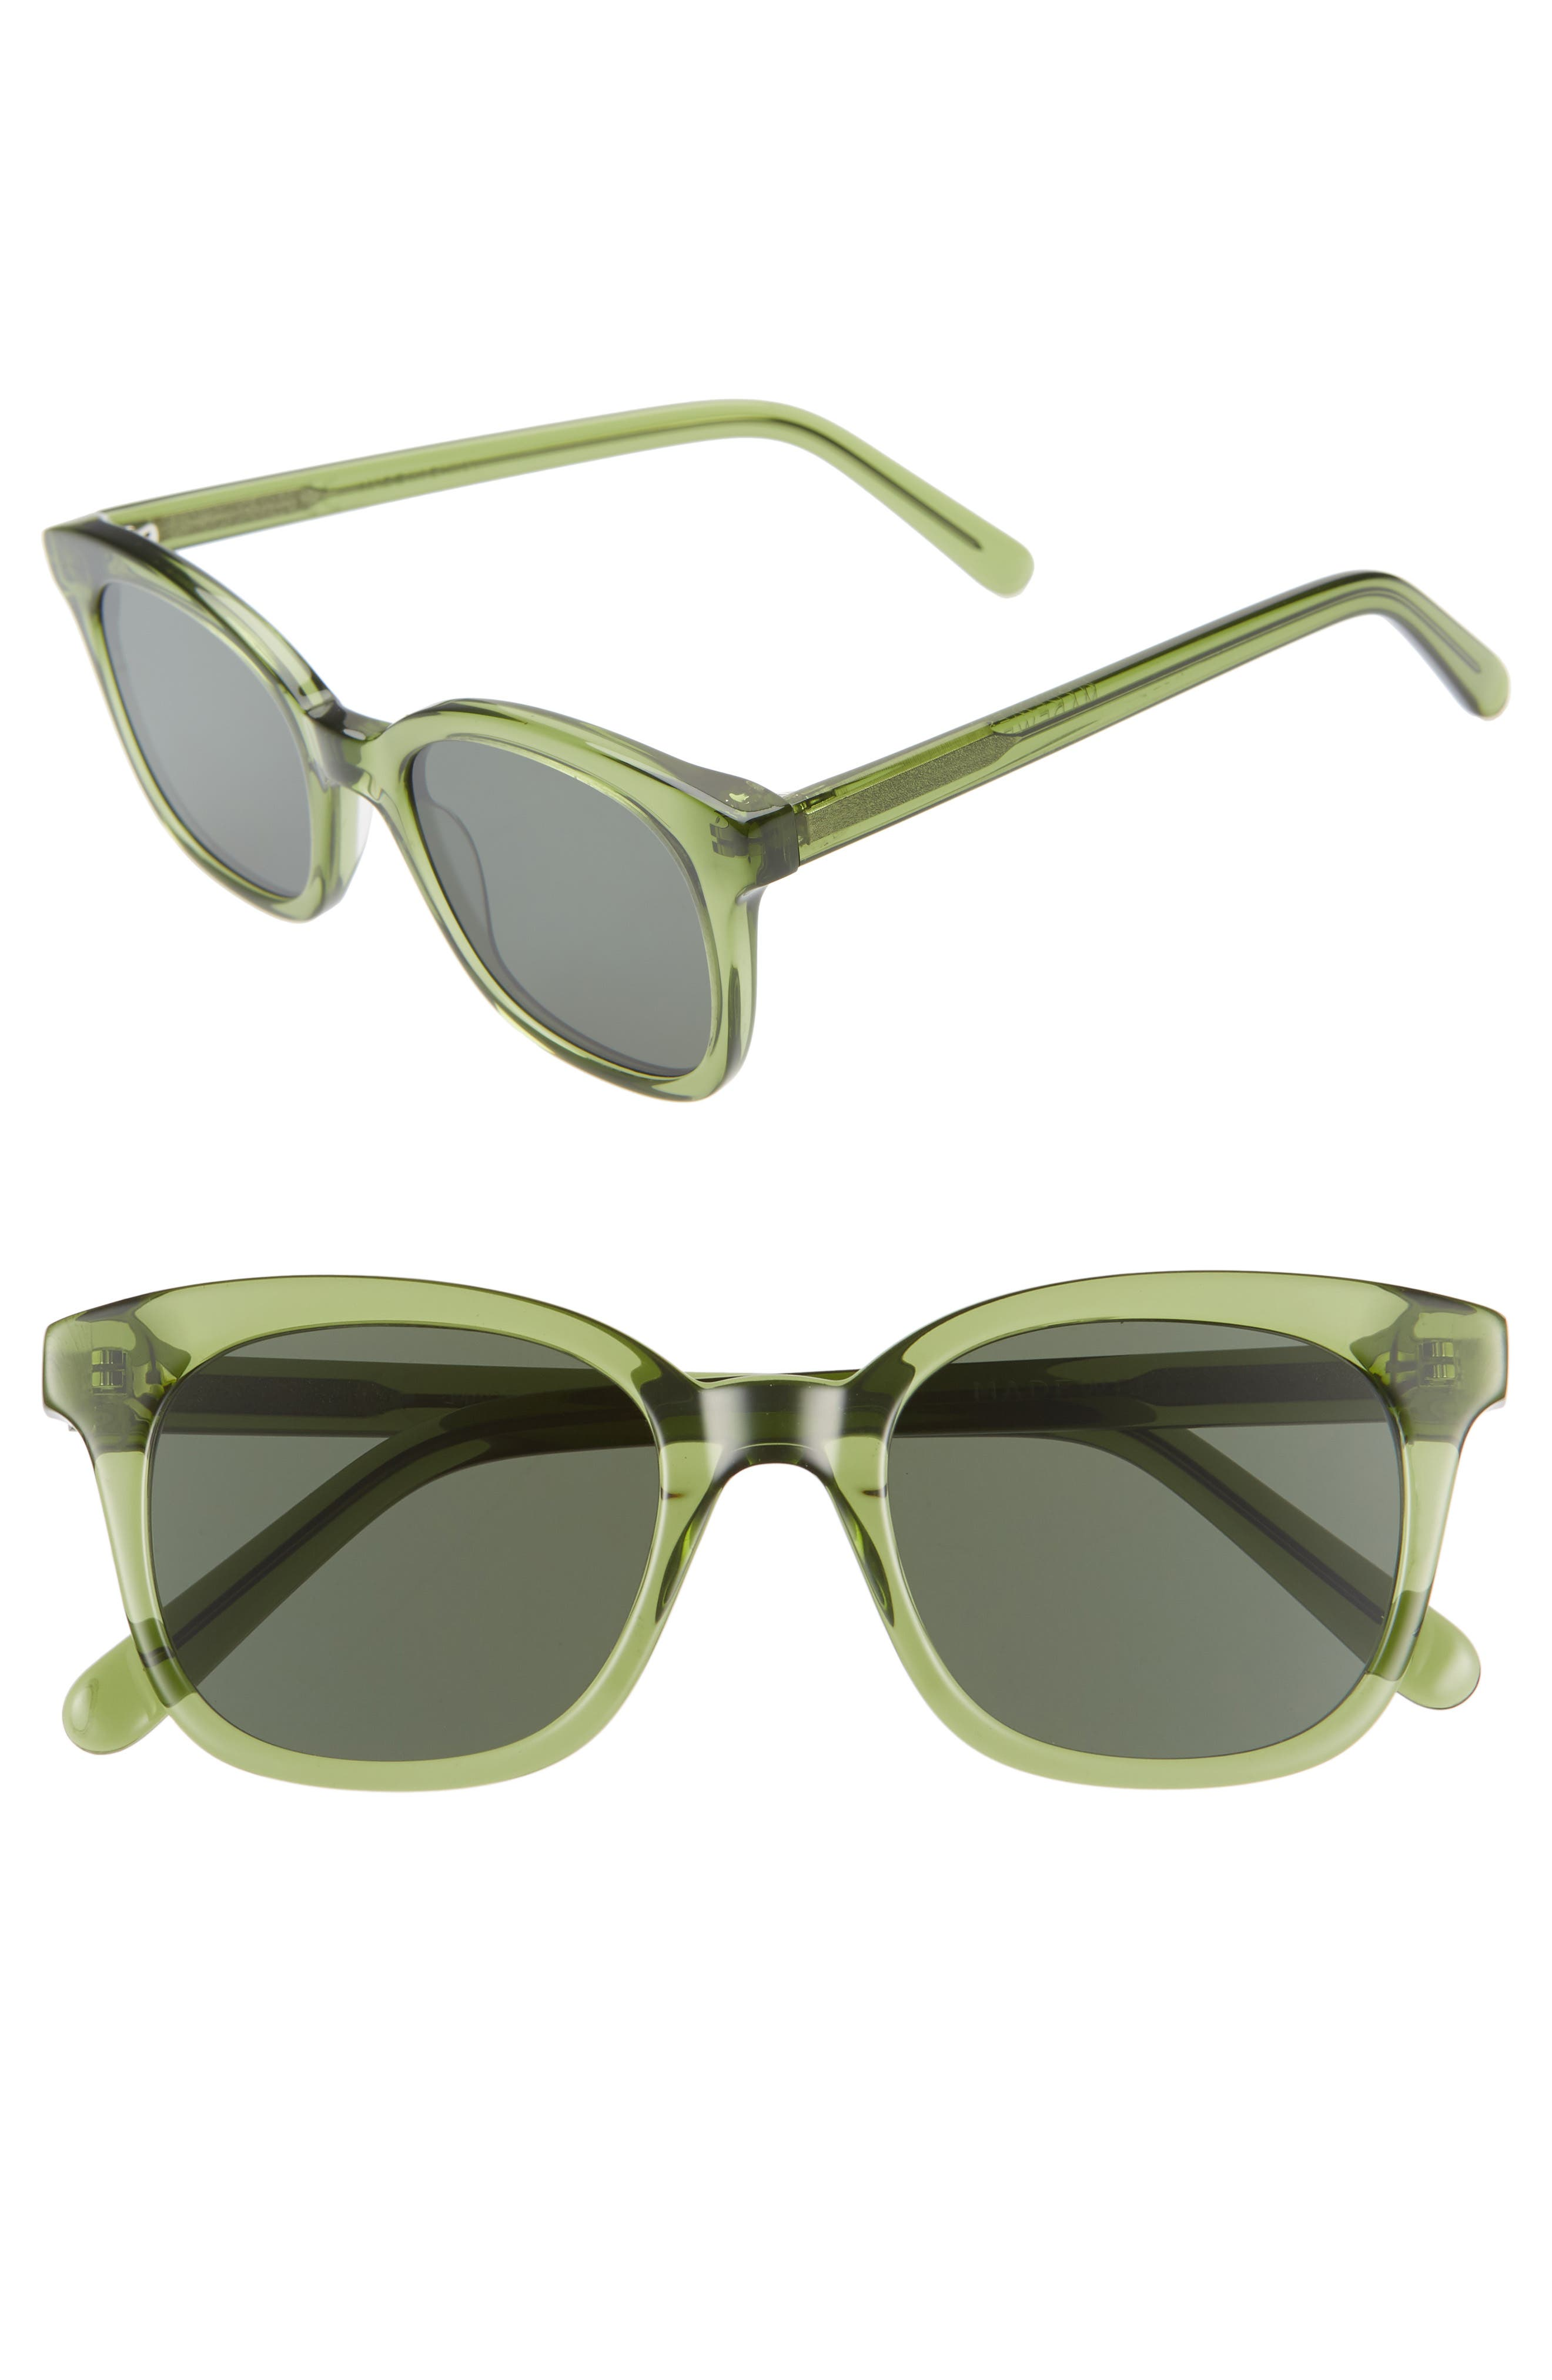 Madewell Venice 4m Flat Frame Sunglasses - Sweet Pine Glass